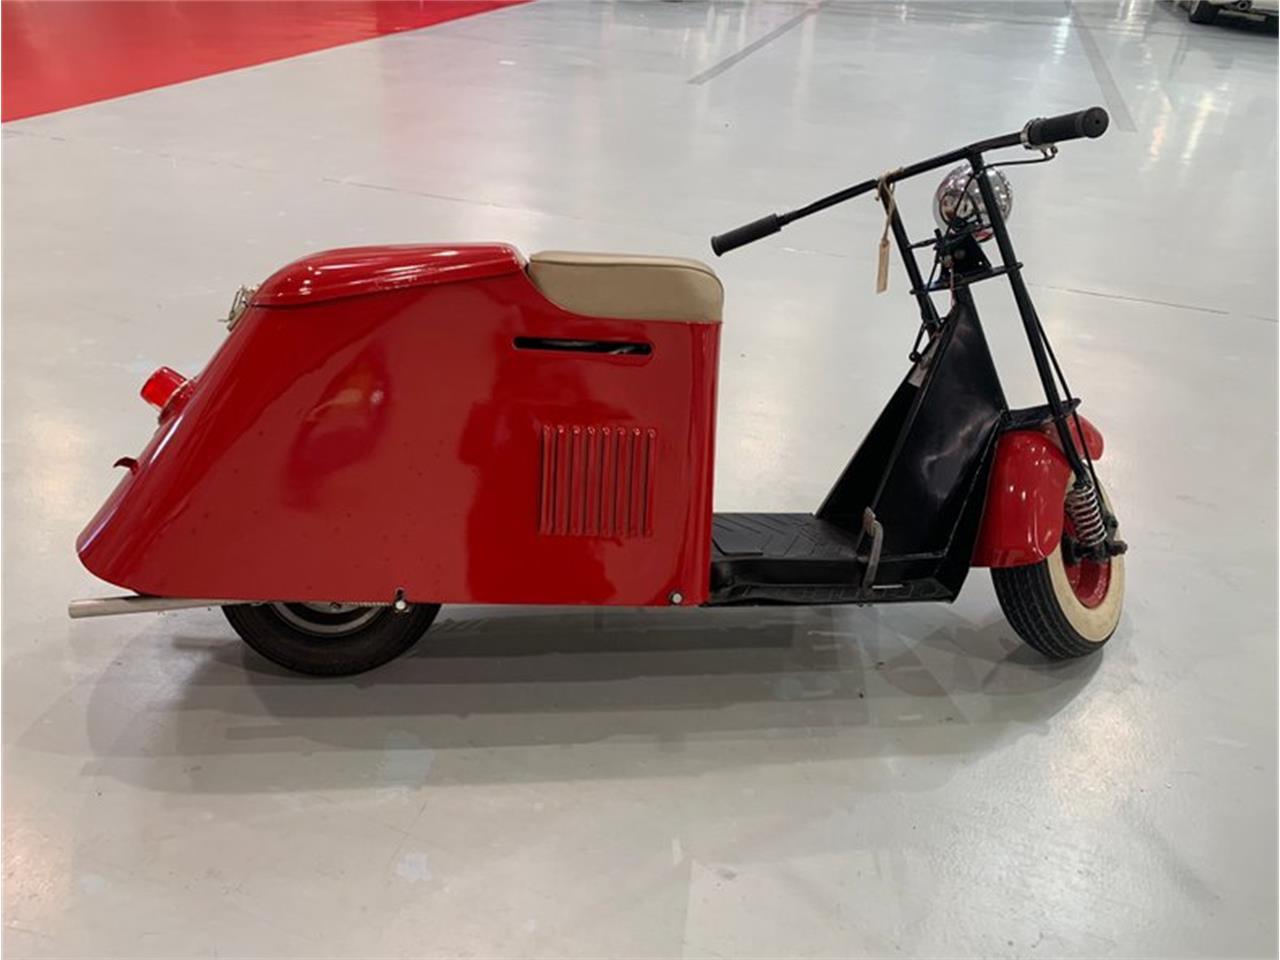 1949 Cushman Motorcycle (CC-1388977) for sale in Greensboro, North Carolina